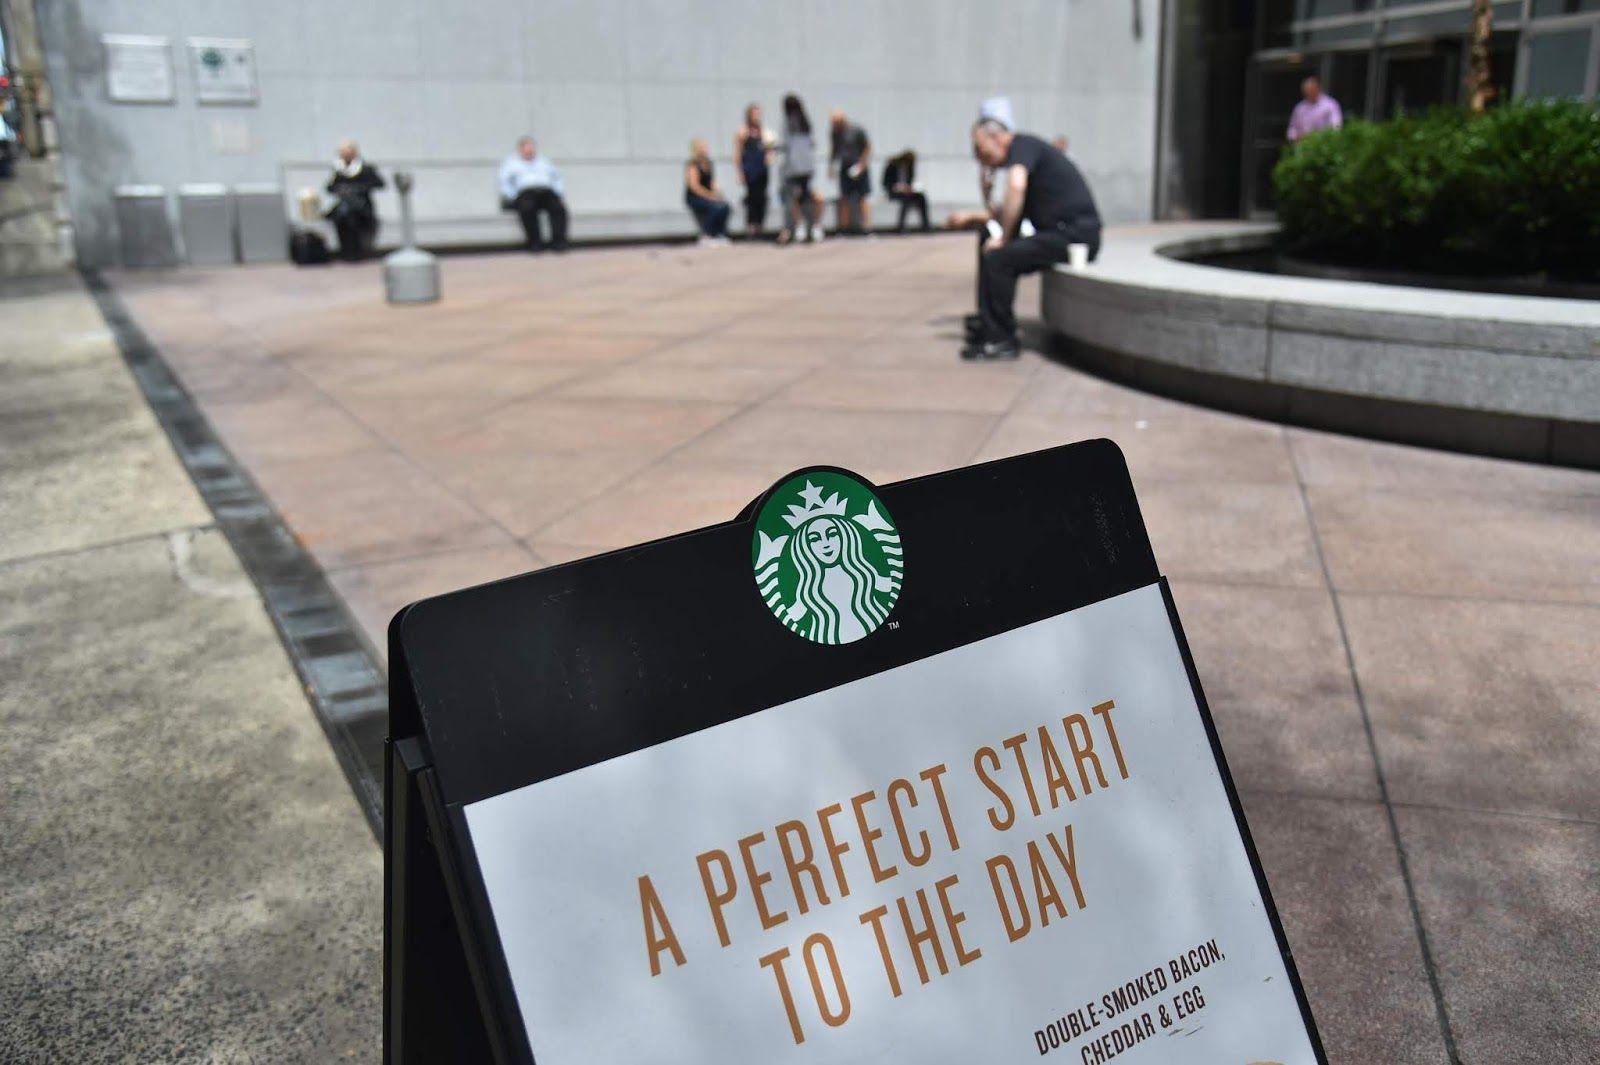 Starbucks Store Closure Tuesday For RacialBias Training